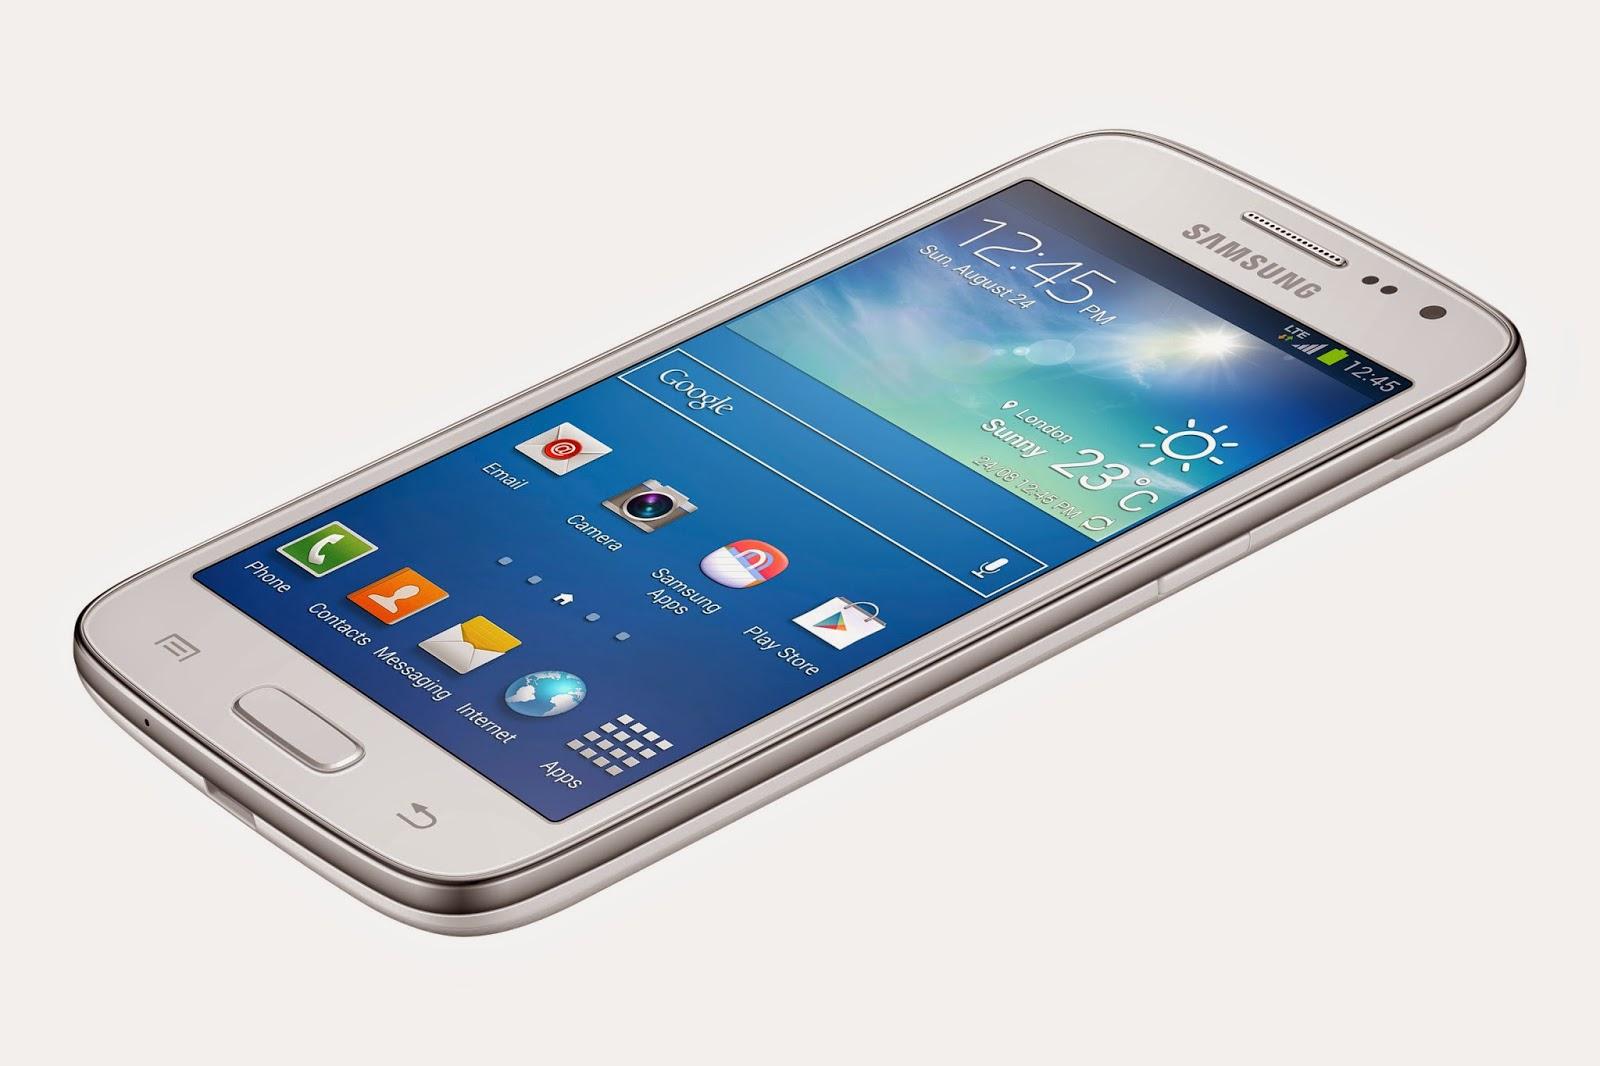 Harga Fitur Spesifikasi Samsung Galaxy Core Lite LTE